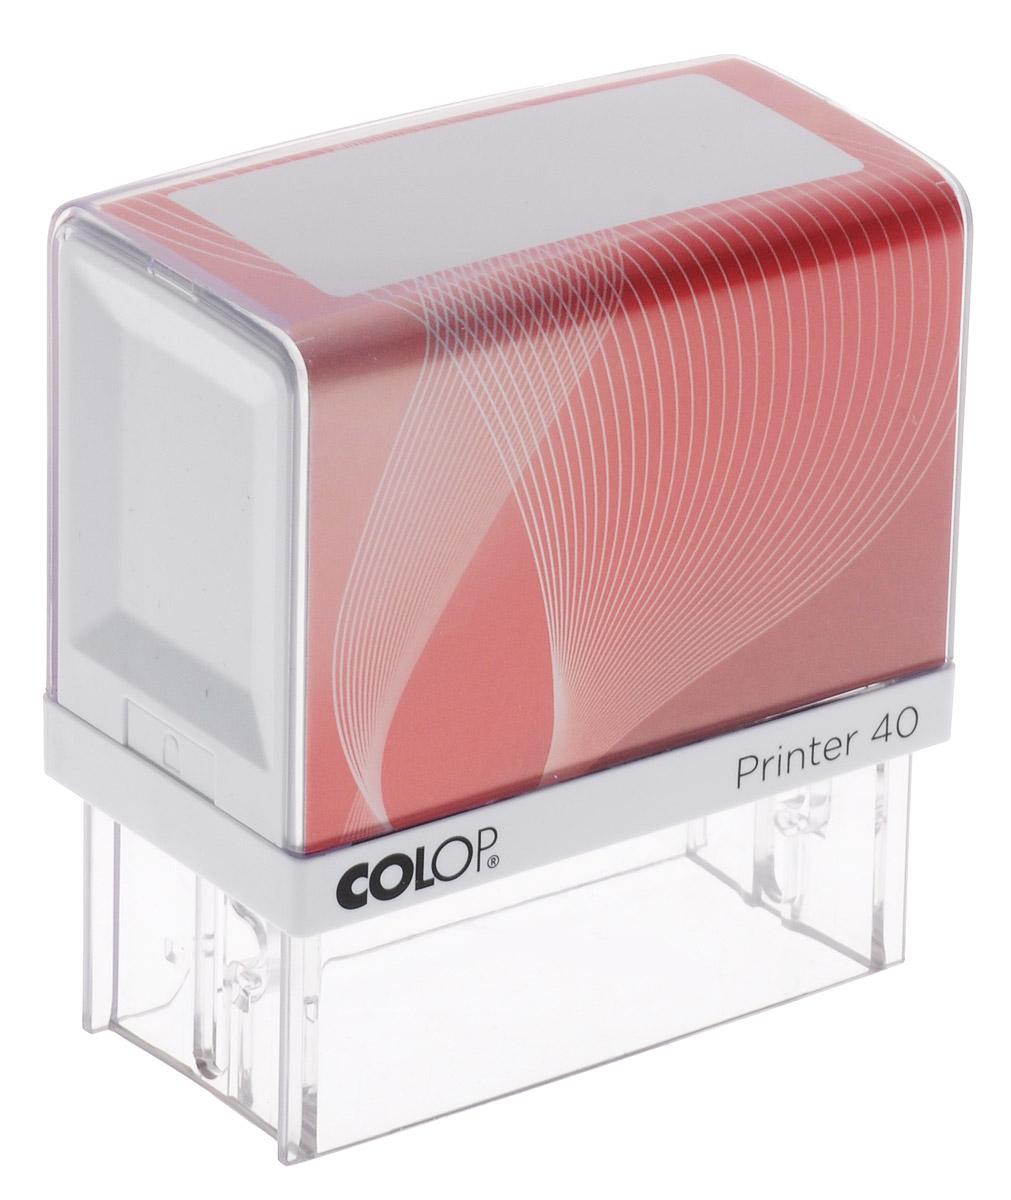 Colop Оснастка для штампа цвет красный 23 х 59 мм -  Штемпельная продукция